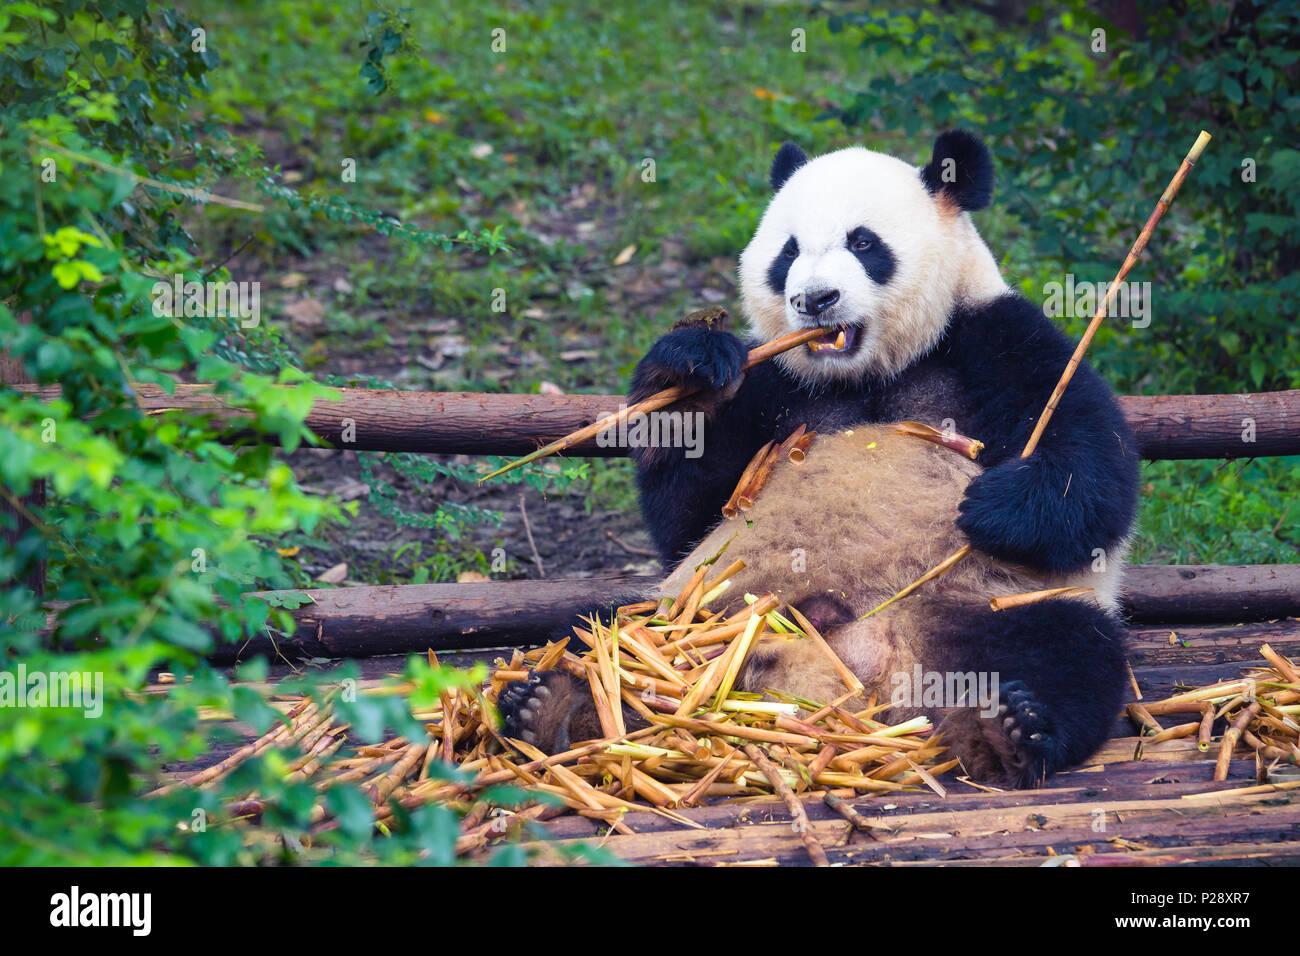 Panda gigante comiendo bambú acostada sobre la madera en Chengdu, provincia de Sichuan, China Imagen De Stock